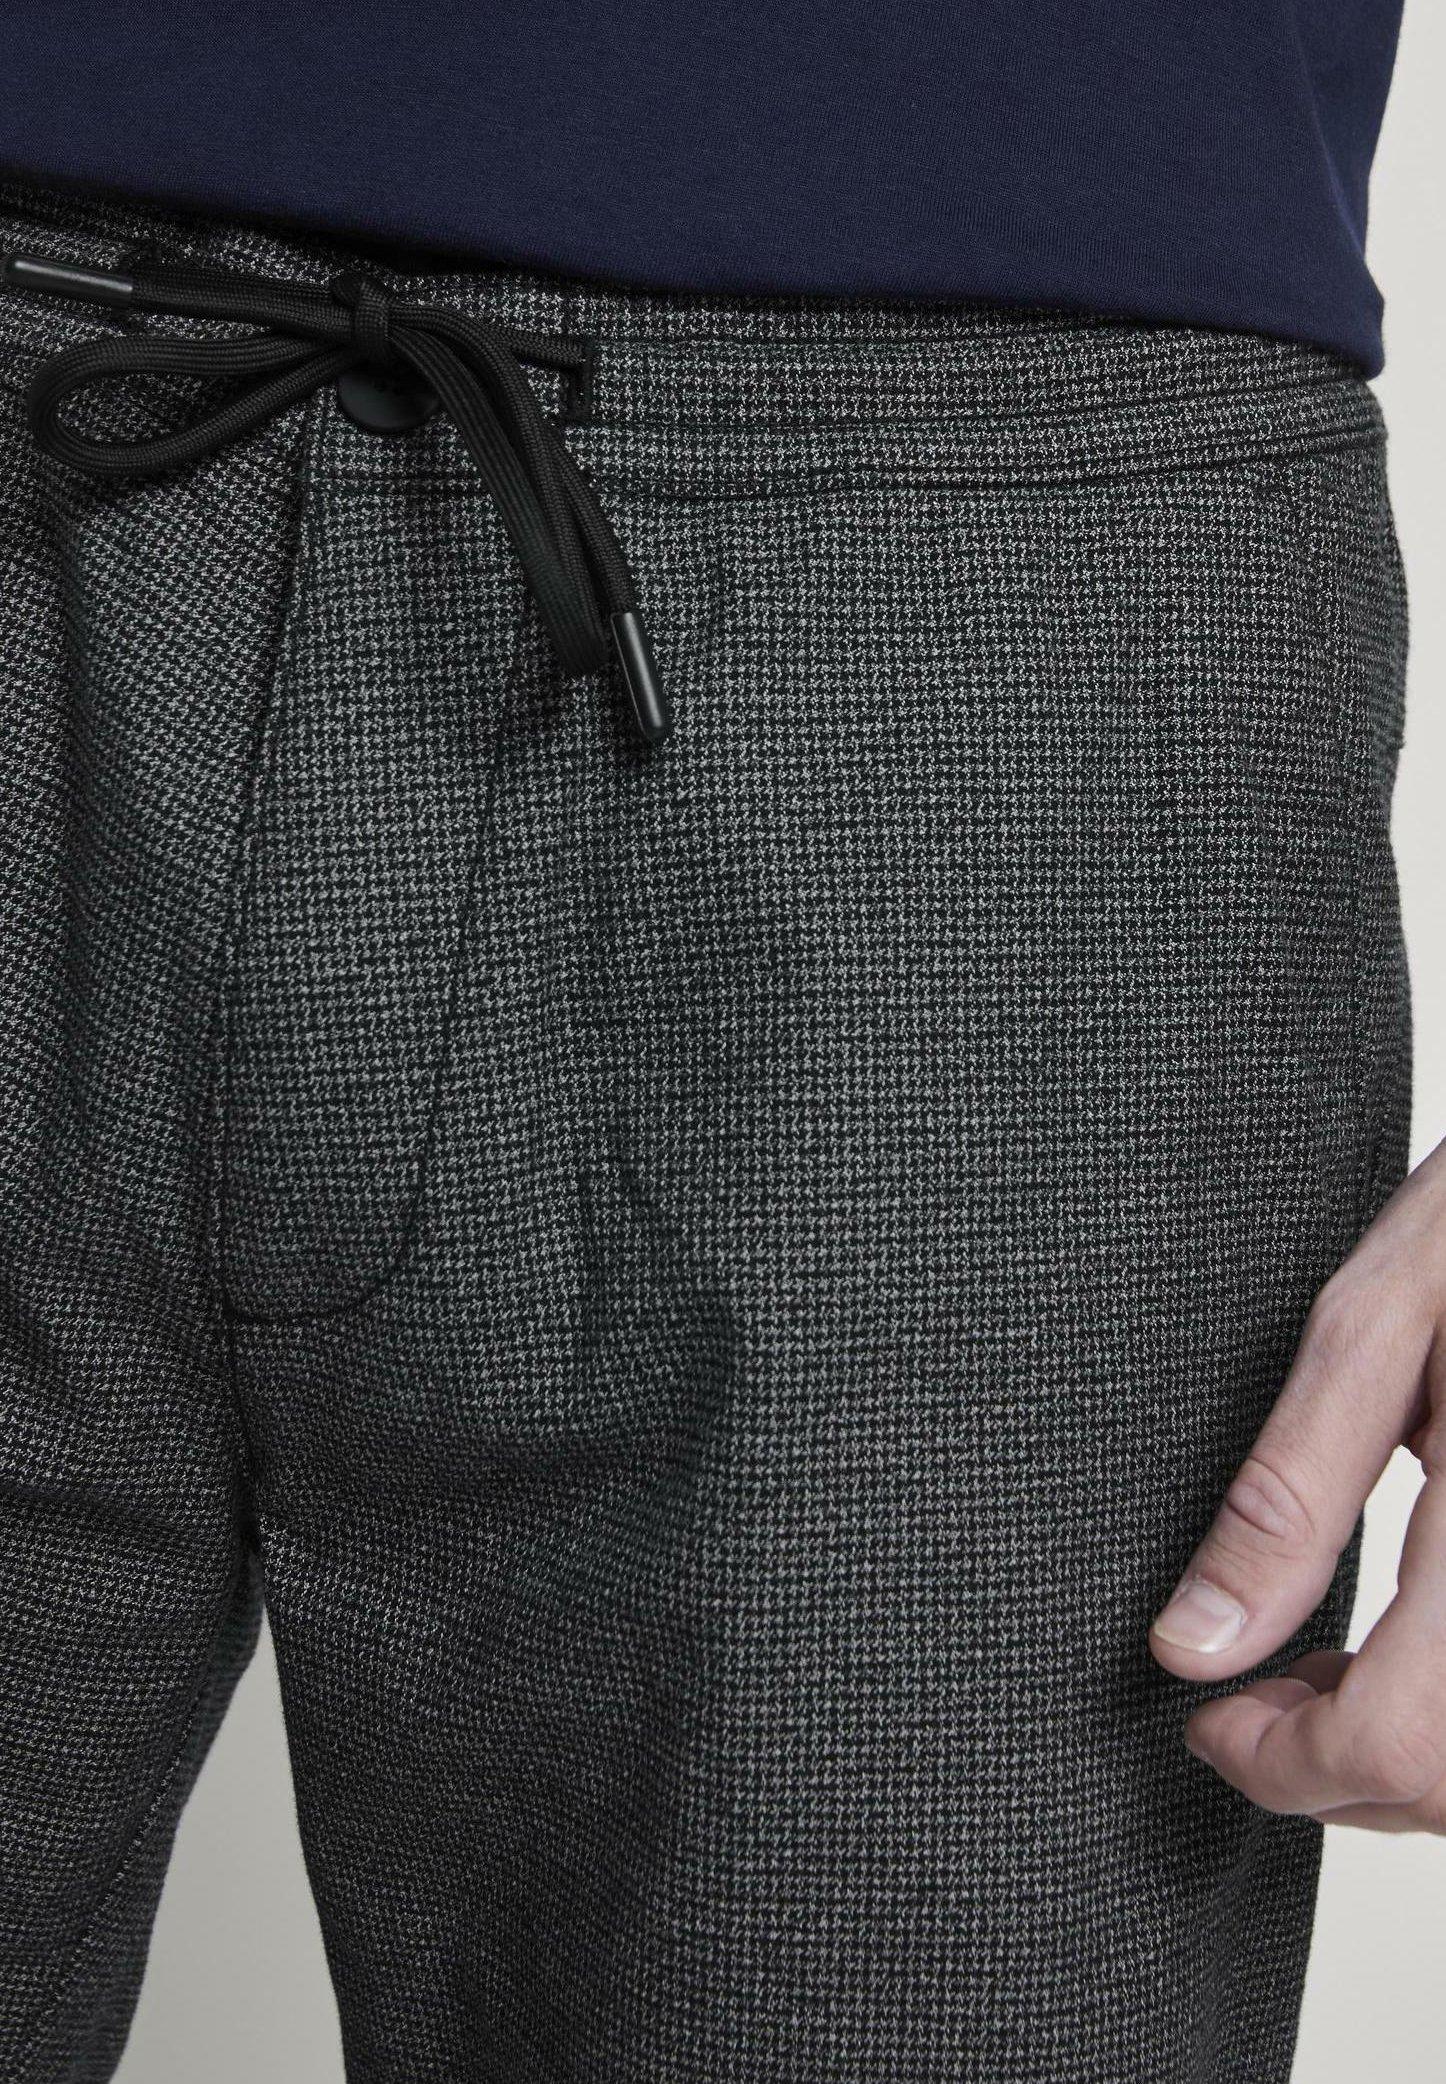 Homme HOSEN & CHINO CHINO SHORTS - Short